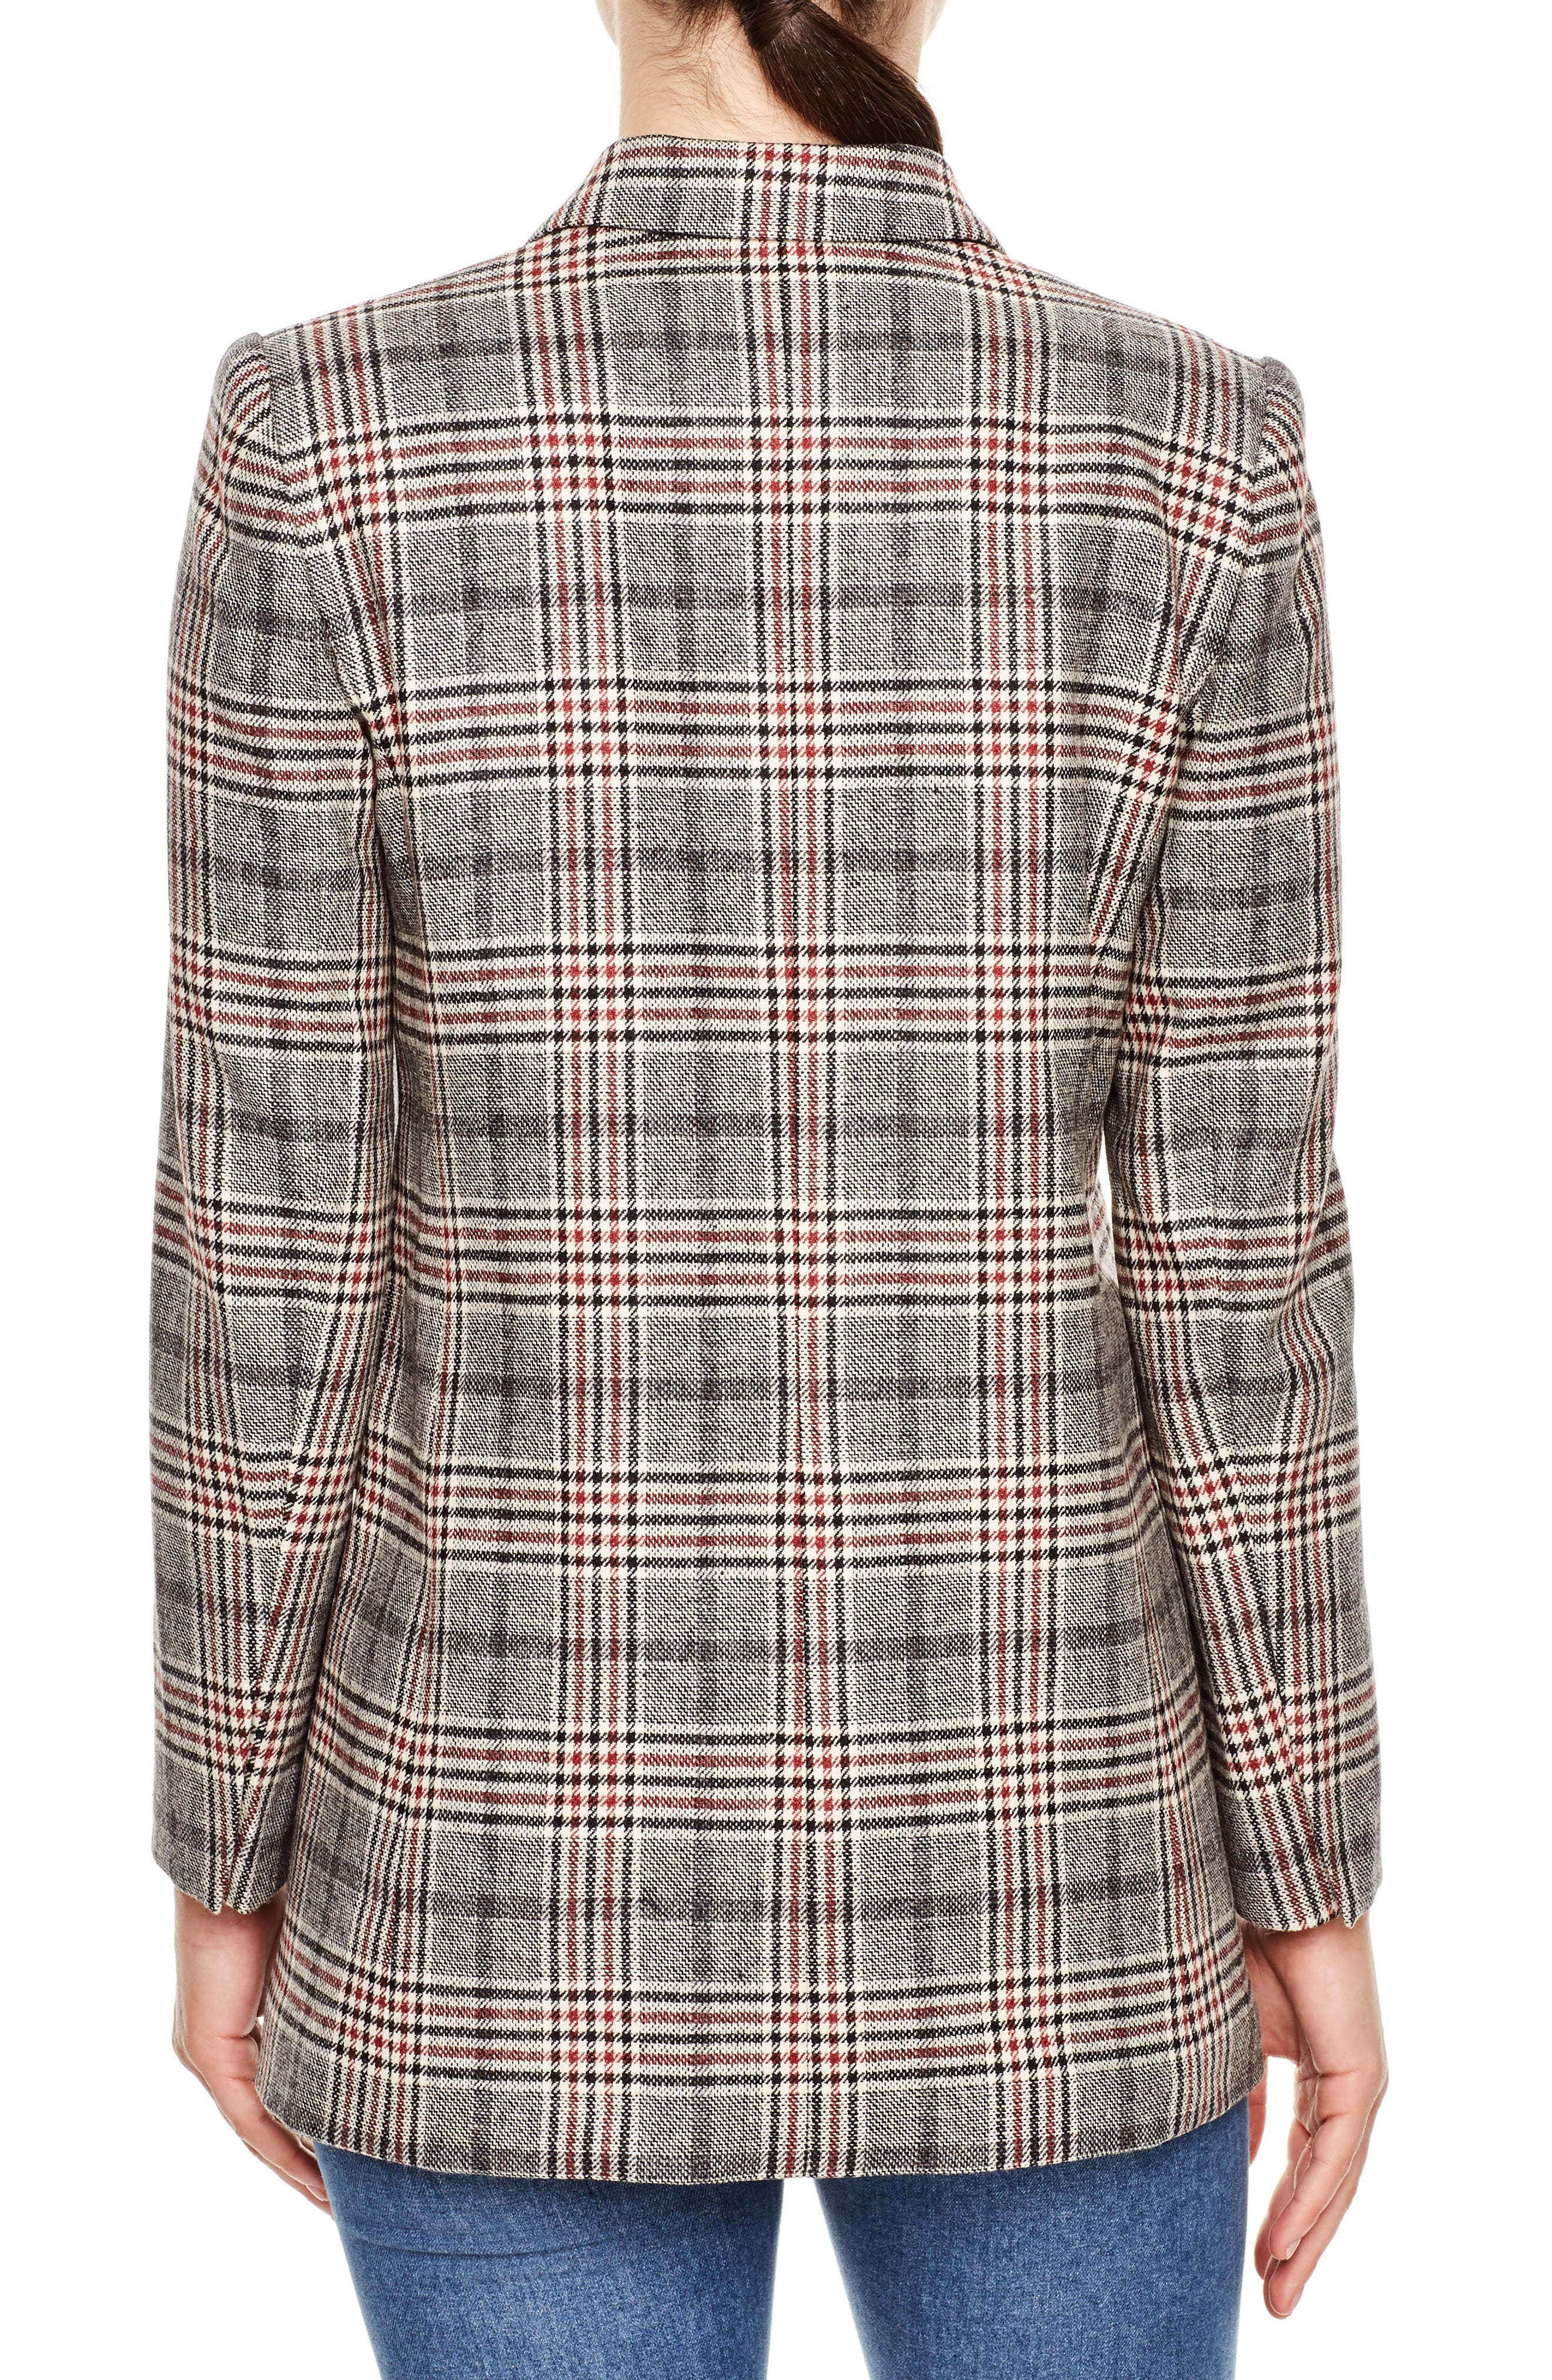 SANDRO, Plaid Wool Blend Jacket, Alternate thumbnail 2, color, 020